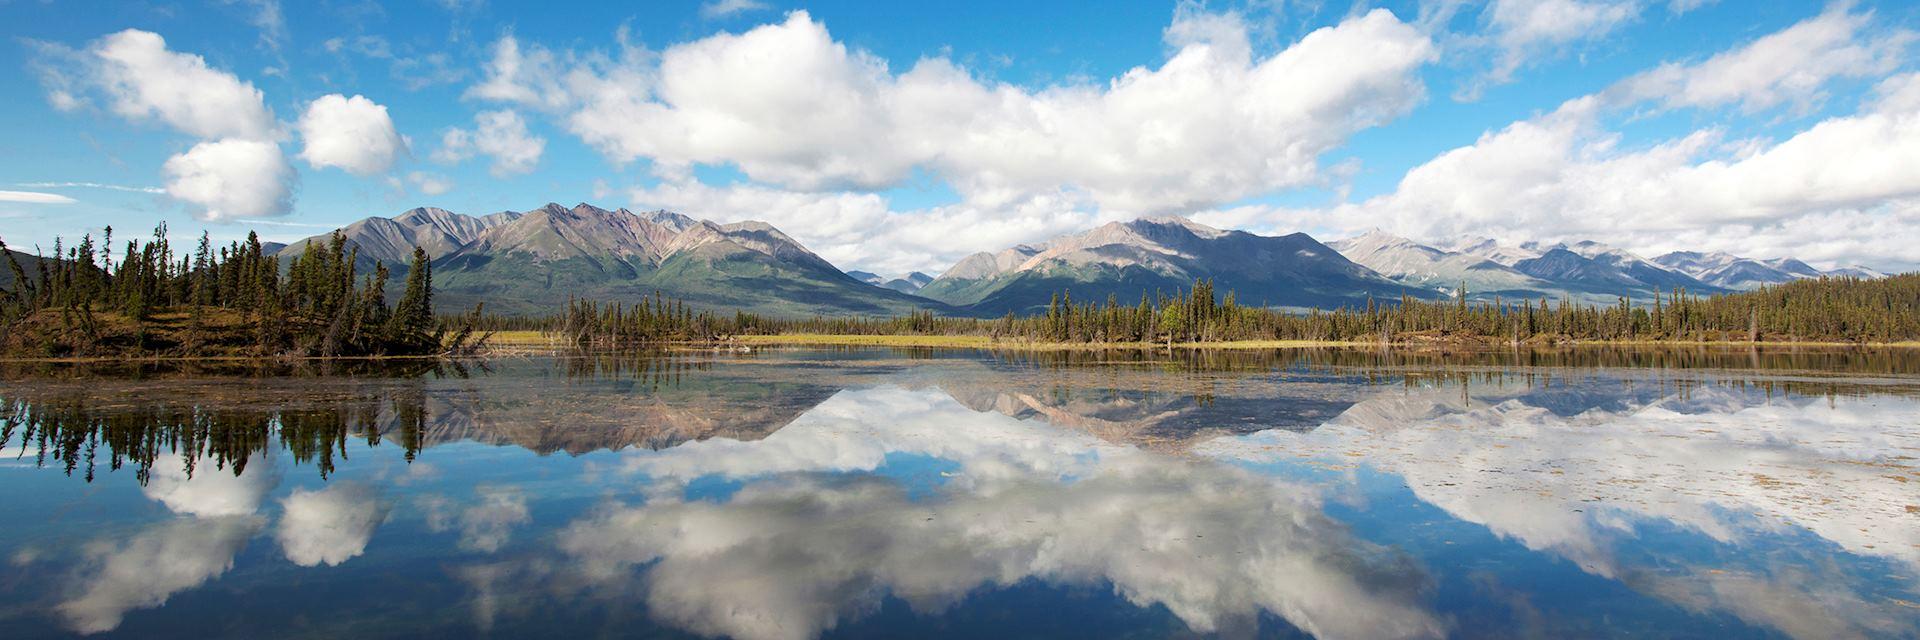 Serenity Lake